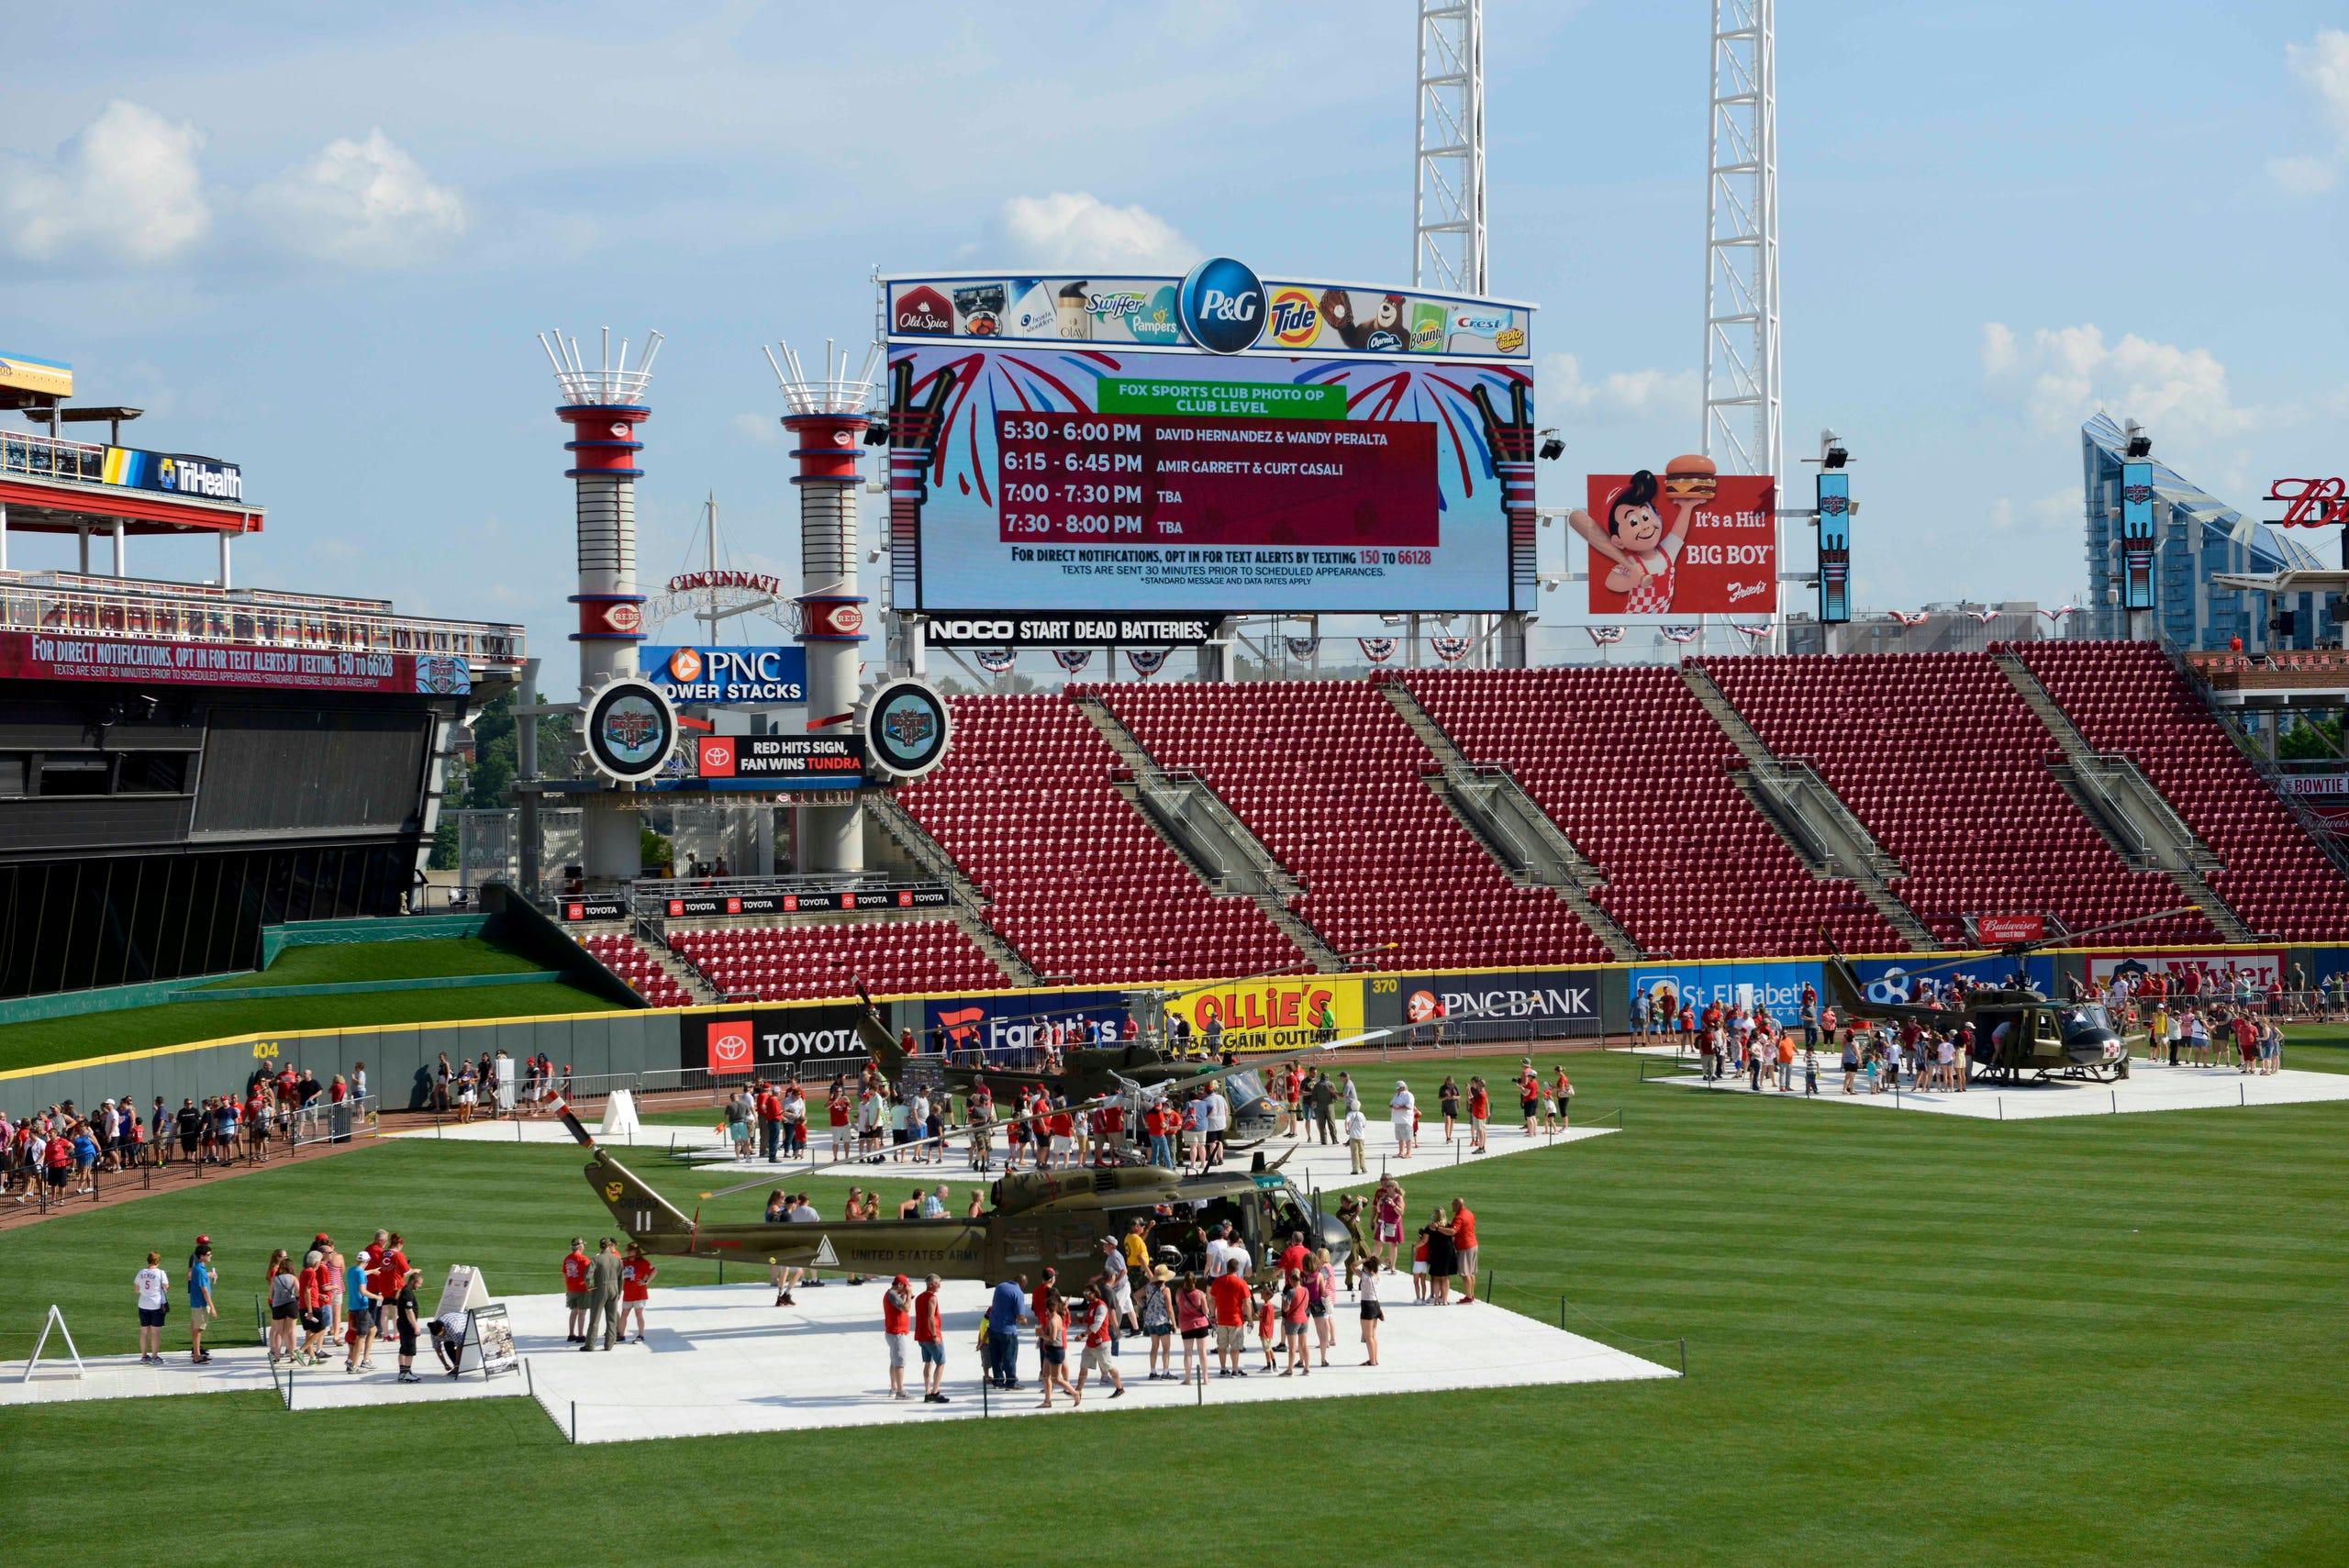 Photos: Cincinnati Reds Rockin' 150 Birthday Bash at Great